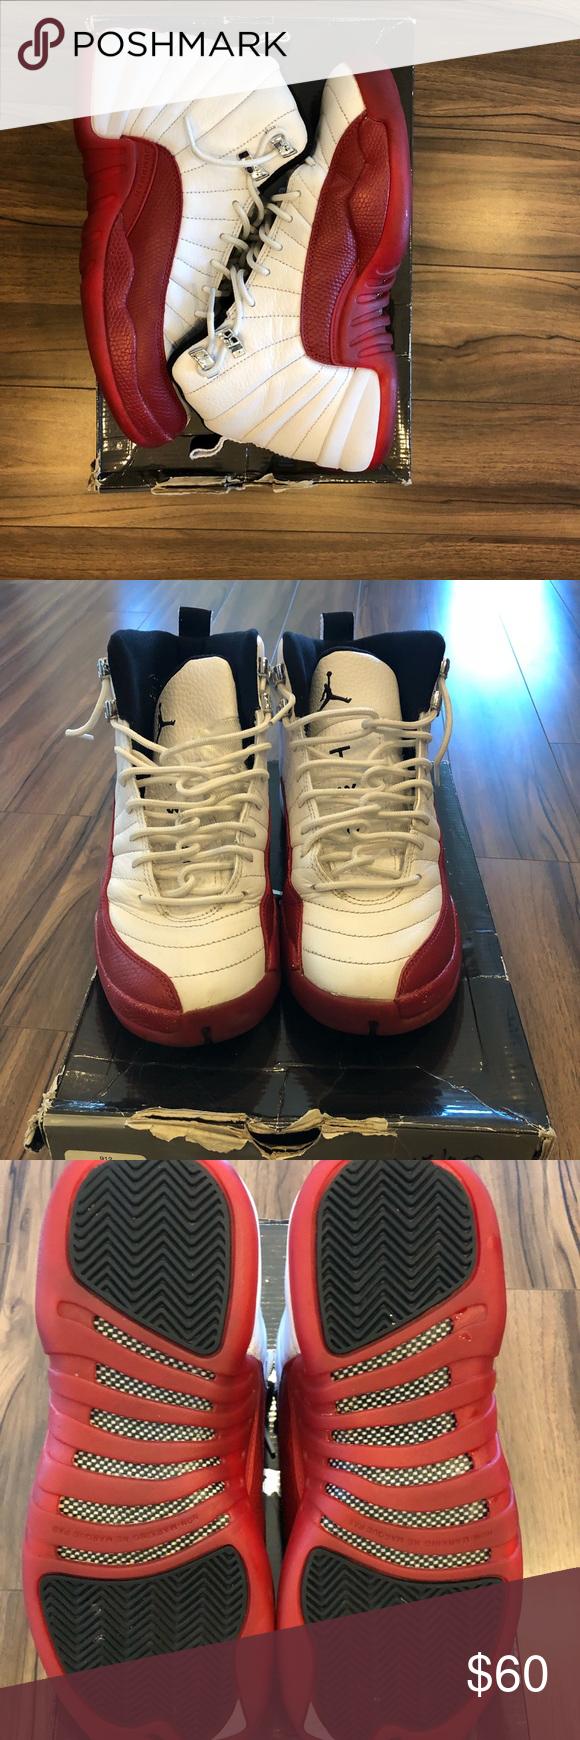 0a001a835f3324 AIR JORDAN 12 CHERRY (GS) 6.5Y Jordan Retro 12 Grade School Sz 6.5Y White Varsity  Red. 130690-110 Used good condition missing insoles Jordan Shoes Sneakers